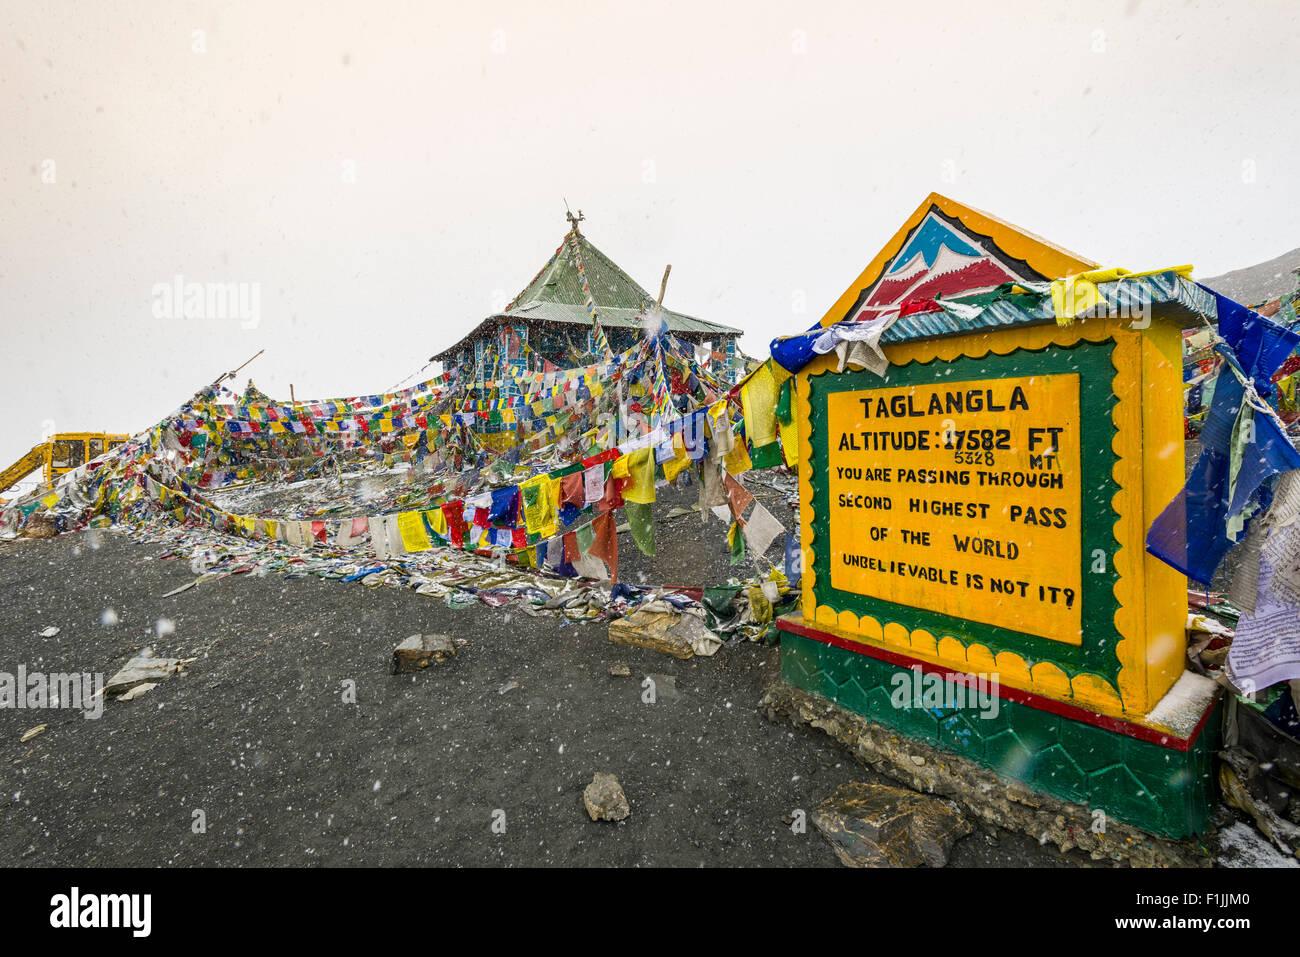 The milestone on top of Taglang La, 5,325 m, the highest pass on the Manali-Leh Highway, during snowfall, Rumtse - Stock Image